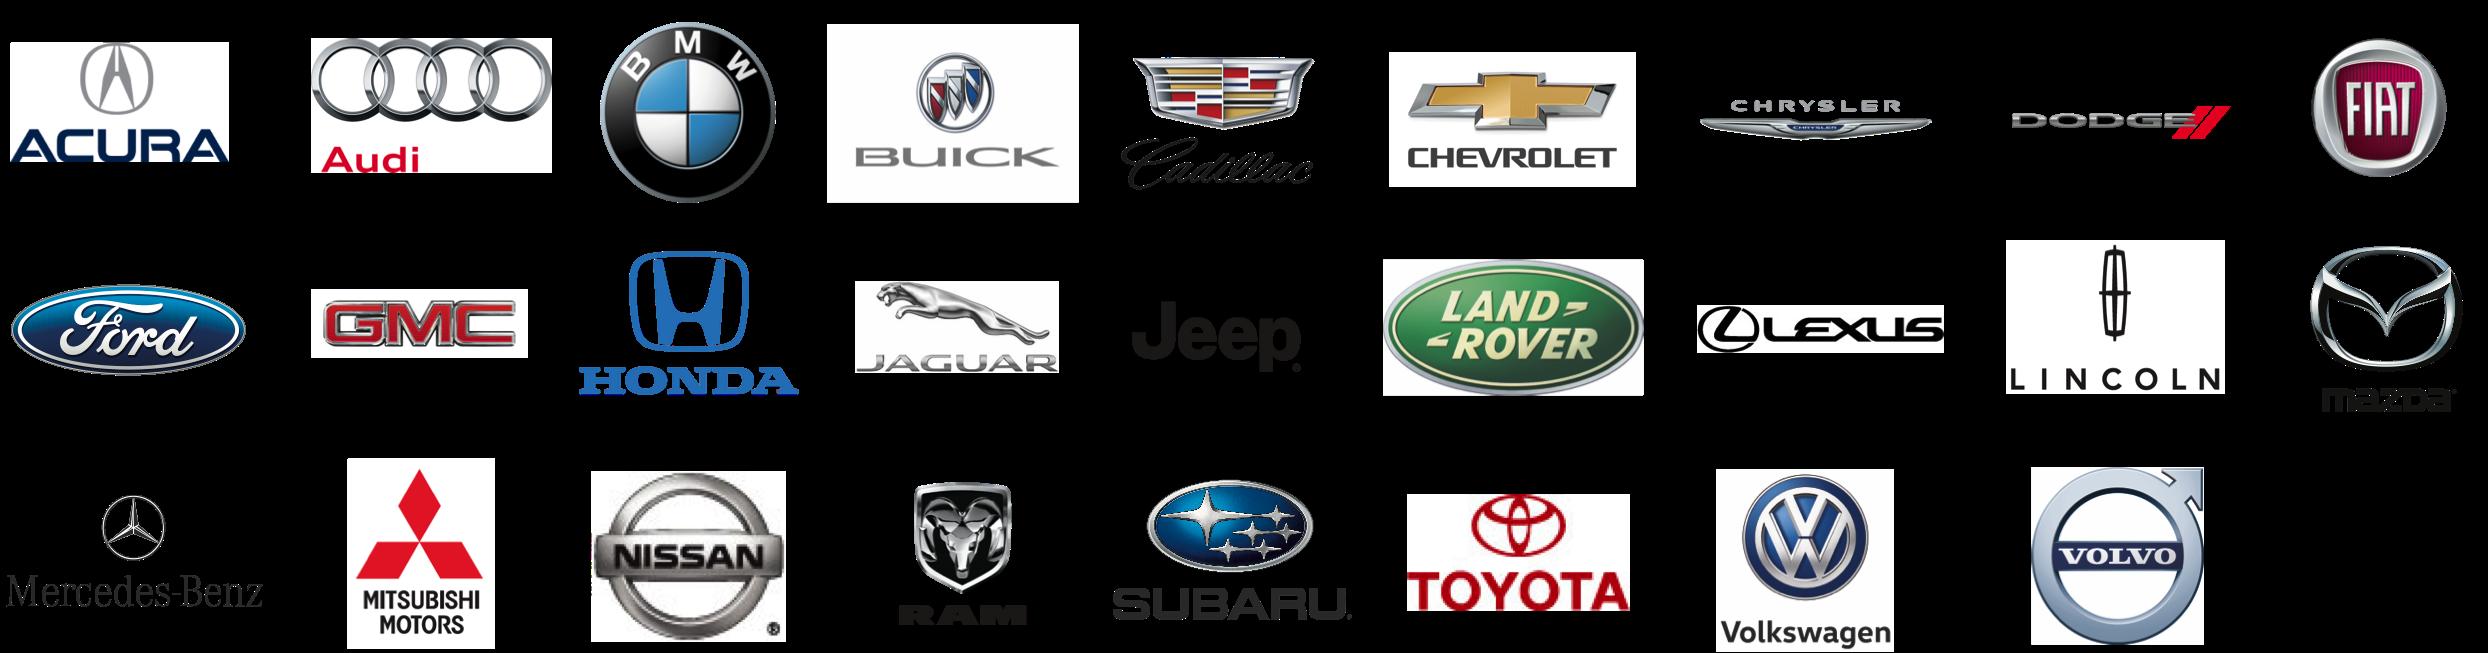 18_17-website-logos